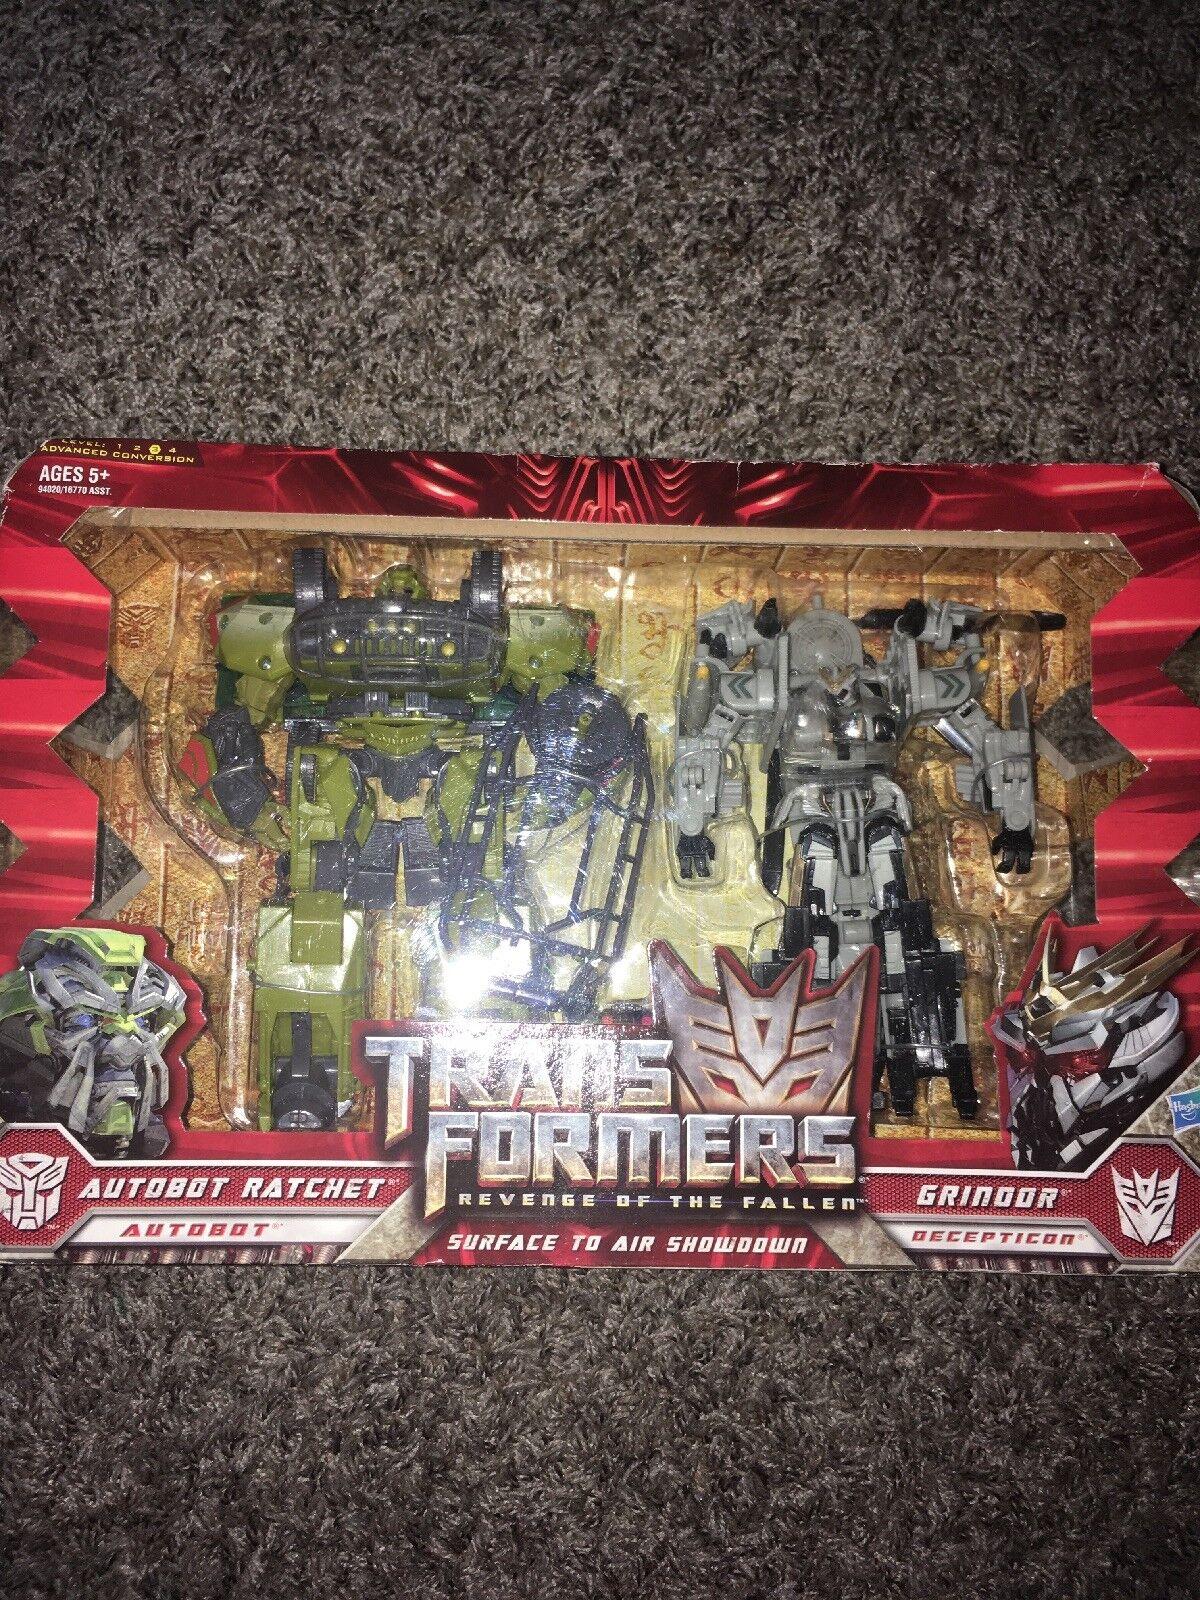 Transformers redF Voyager Autobot Ratchet VS Decepticon Grindor Set MISB Hasbro